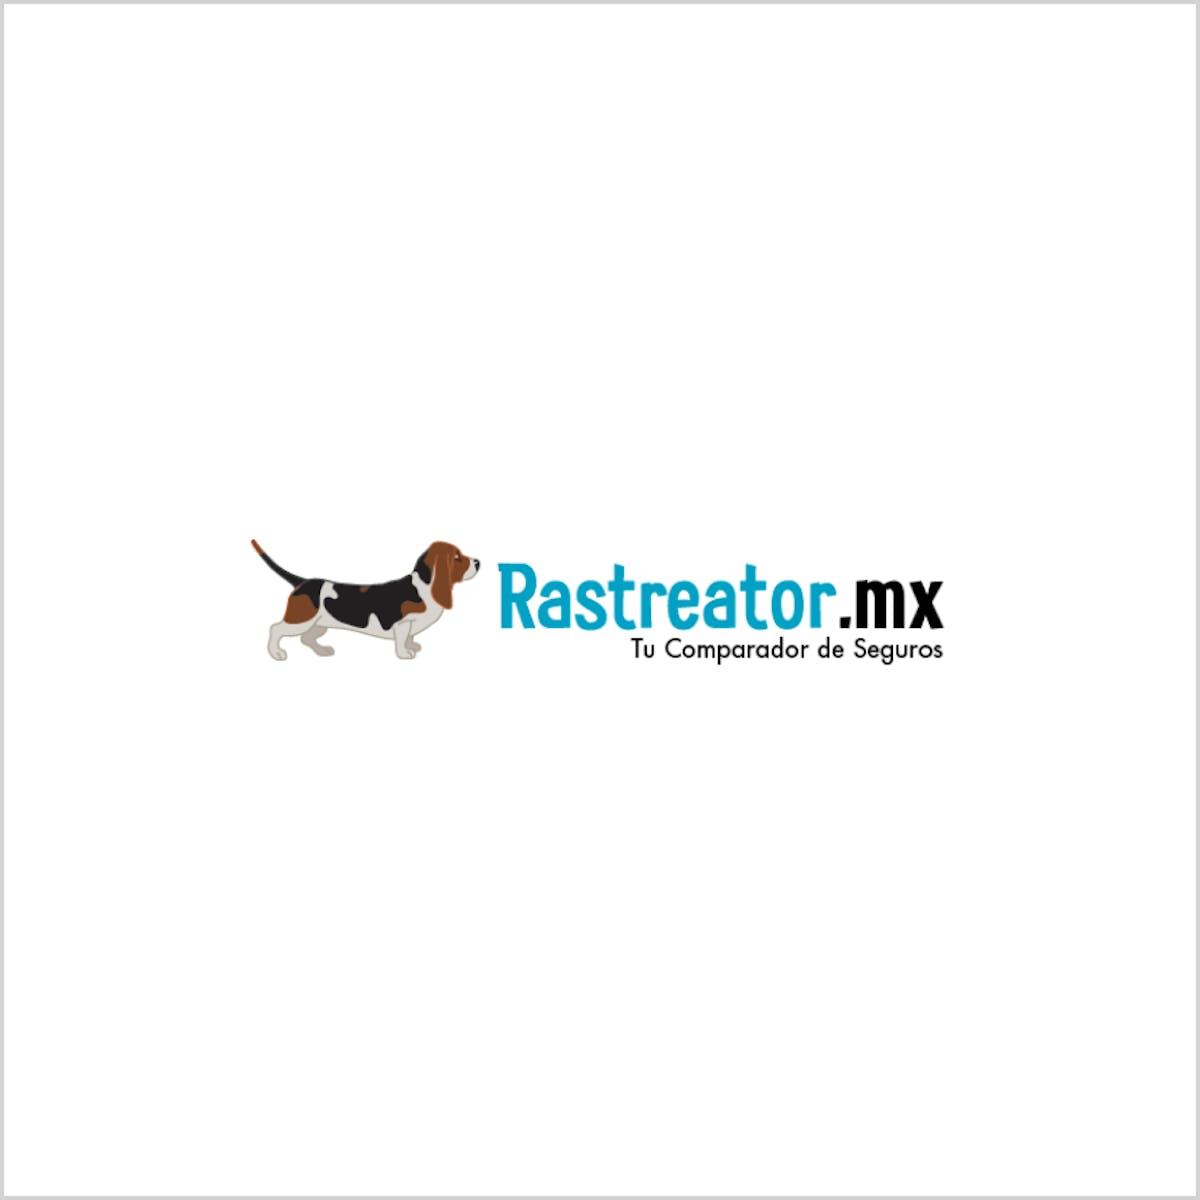 Rastreator.mx logo